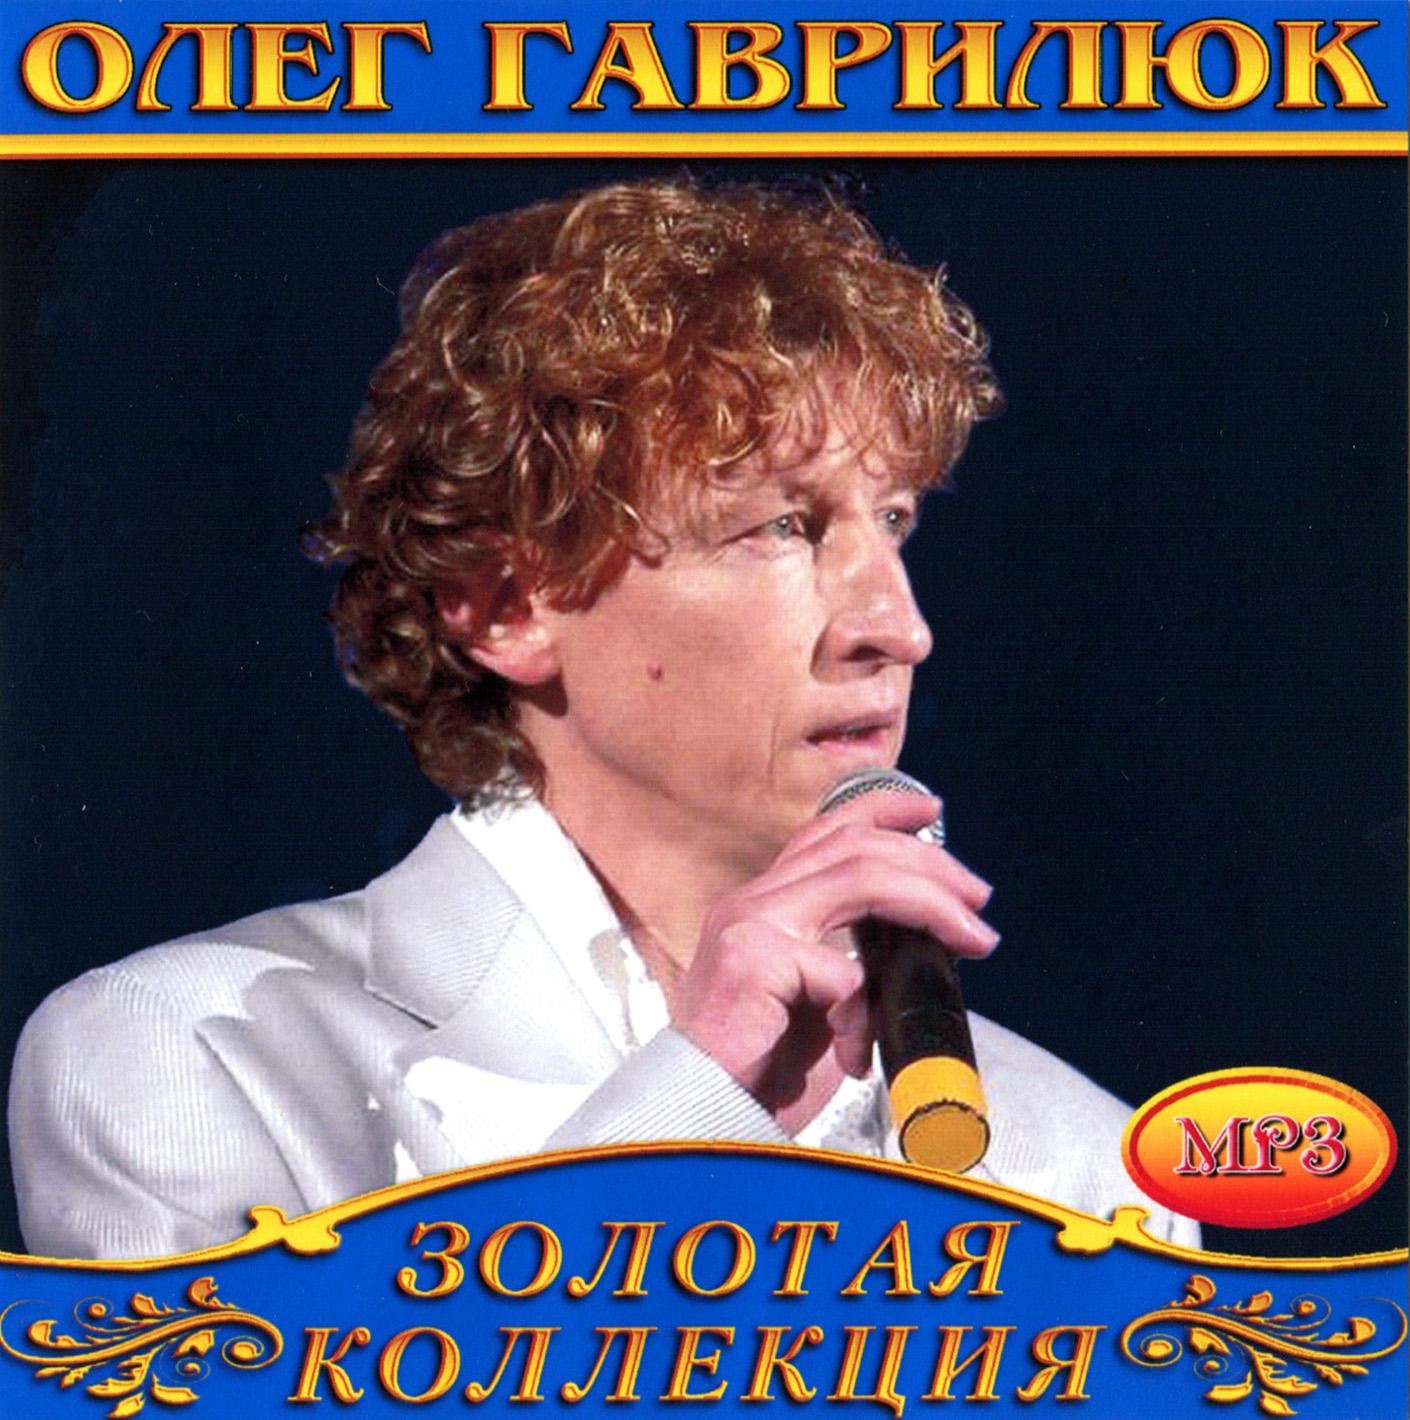 Олег Гаврилюк [mp3]